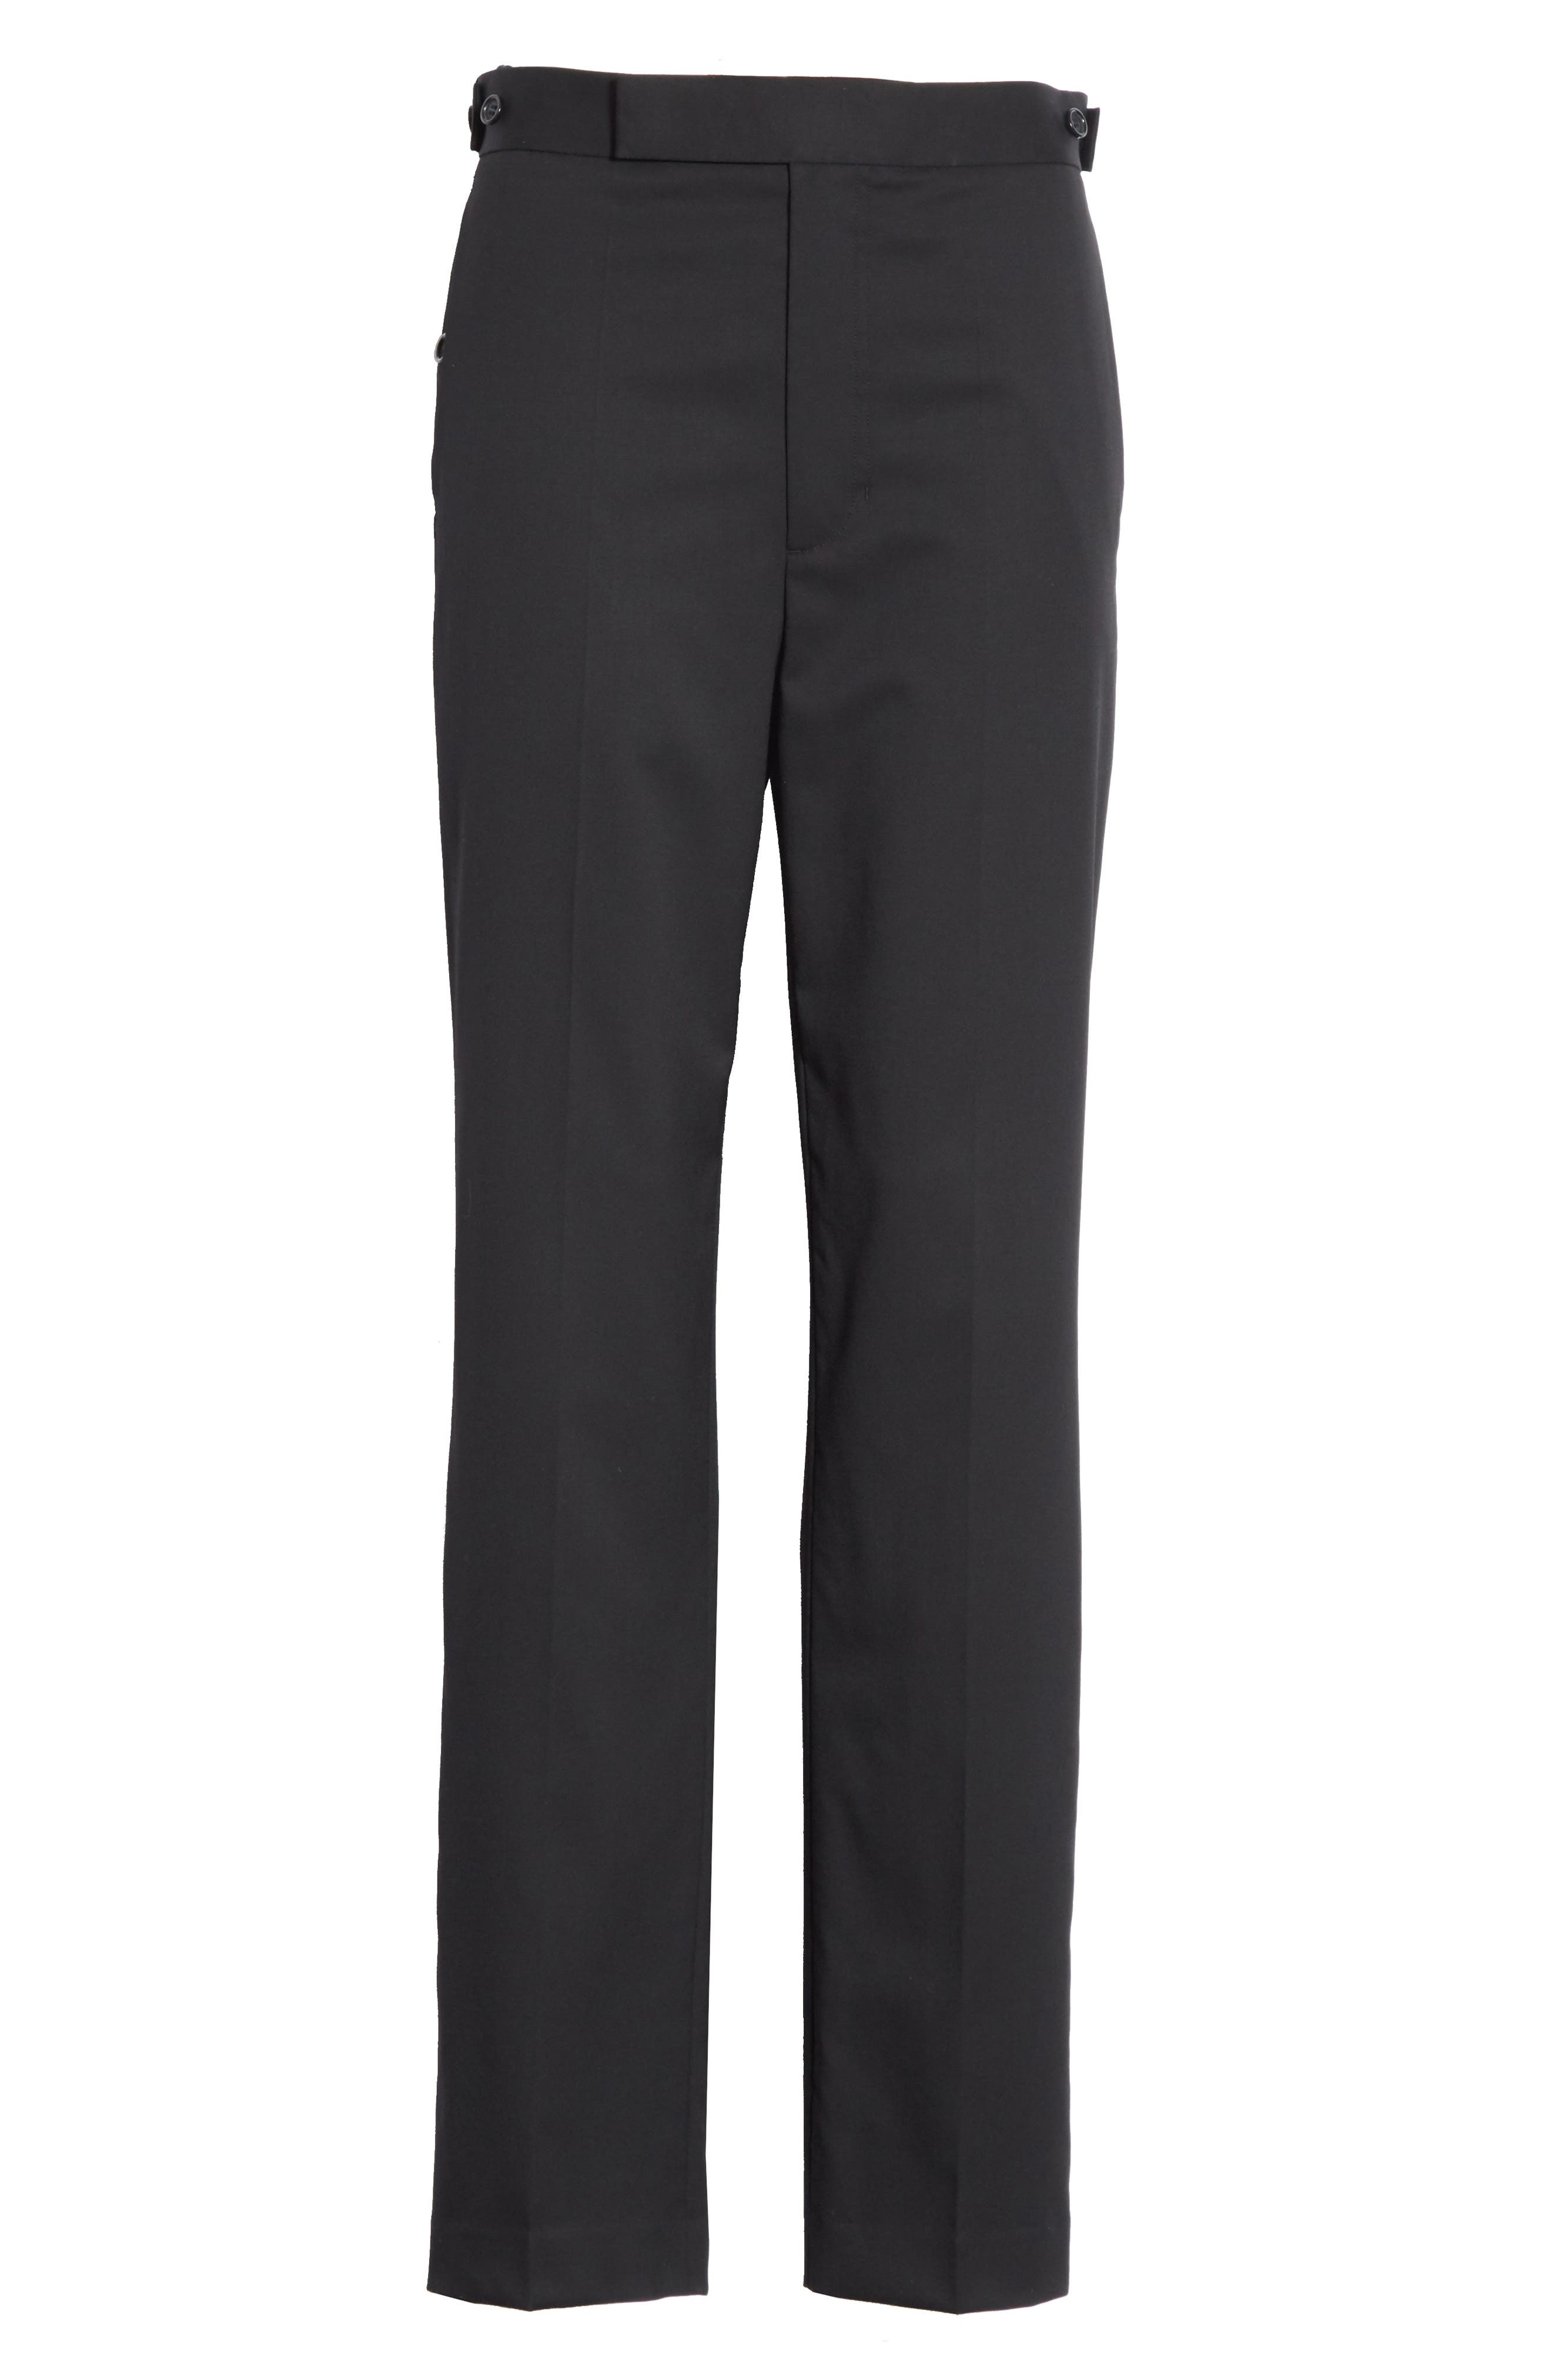 Straight Leg Wool Trousers,                             Alternate thumbnail 6, color,                             Black